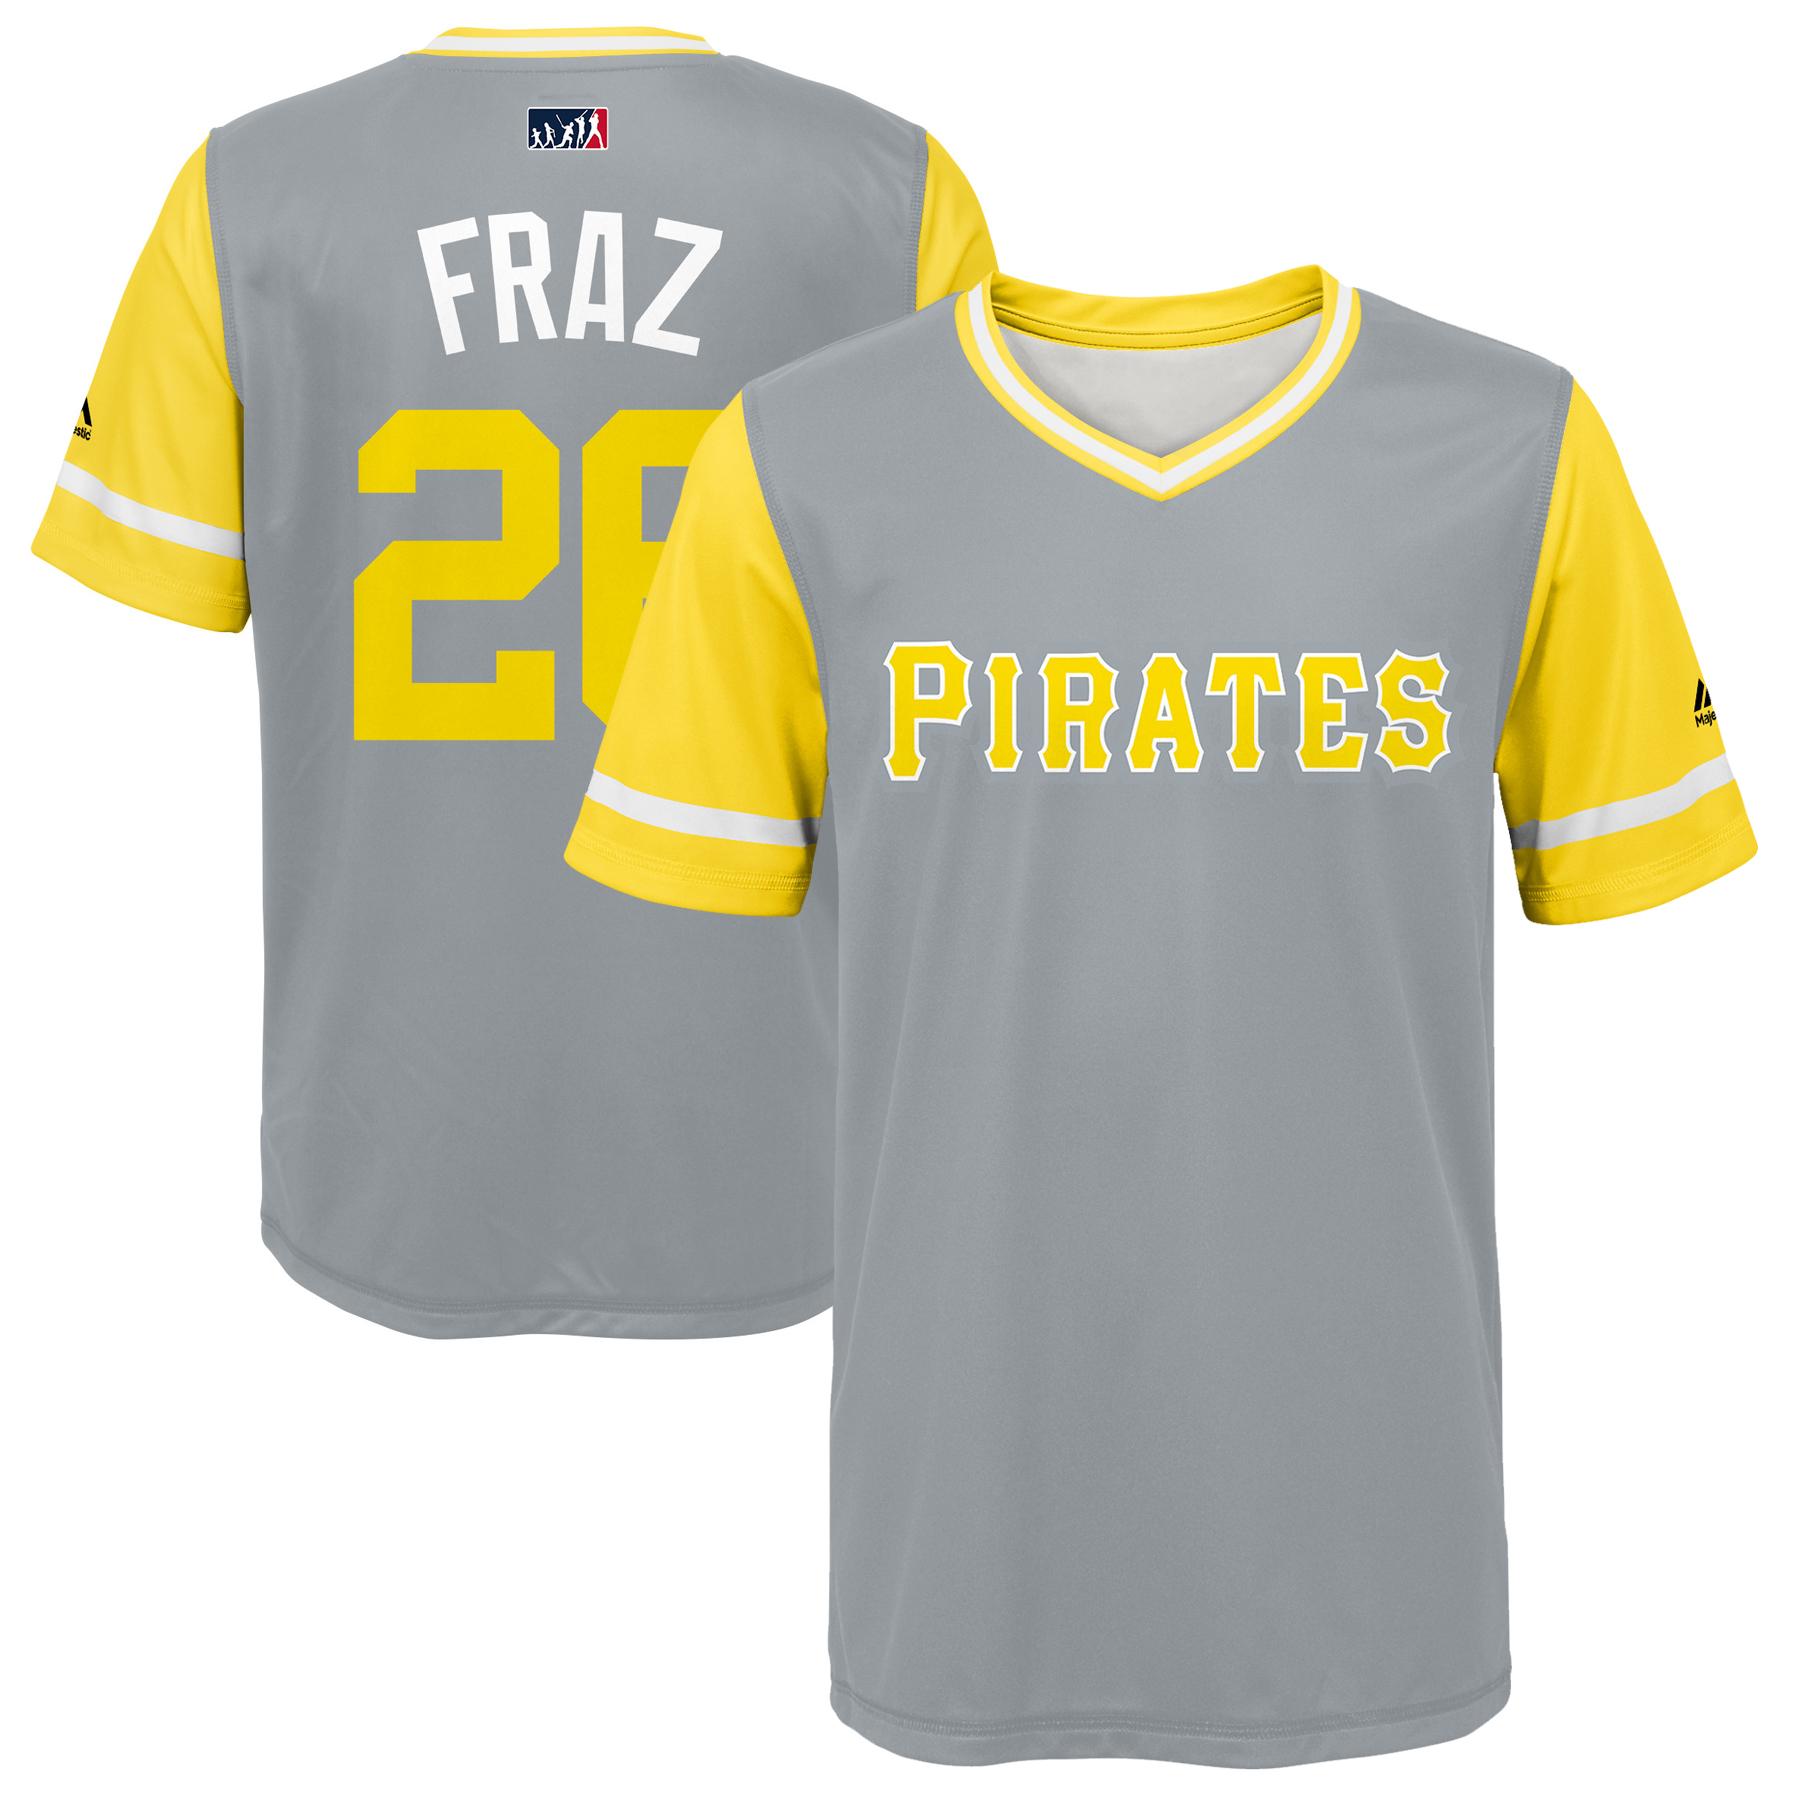 "Adam Frazier ""Fraz"" Pittsburgh Pirates Majestic Youth 2018 Players' Weekend Jersey - Gray/Yellow"